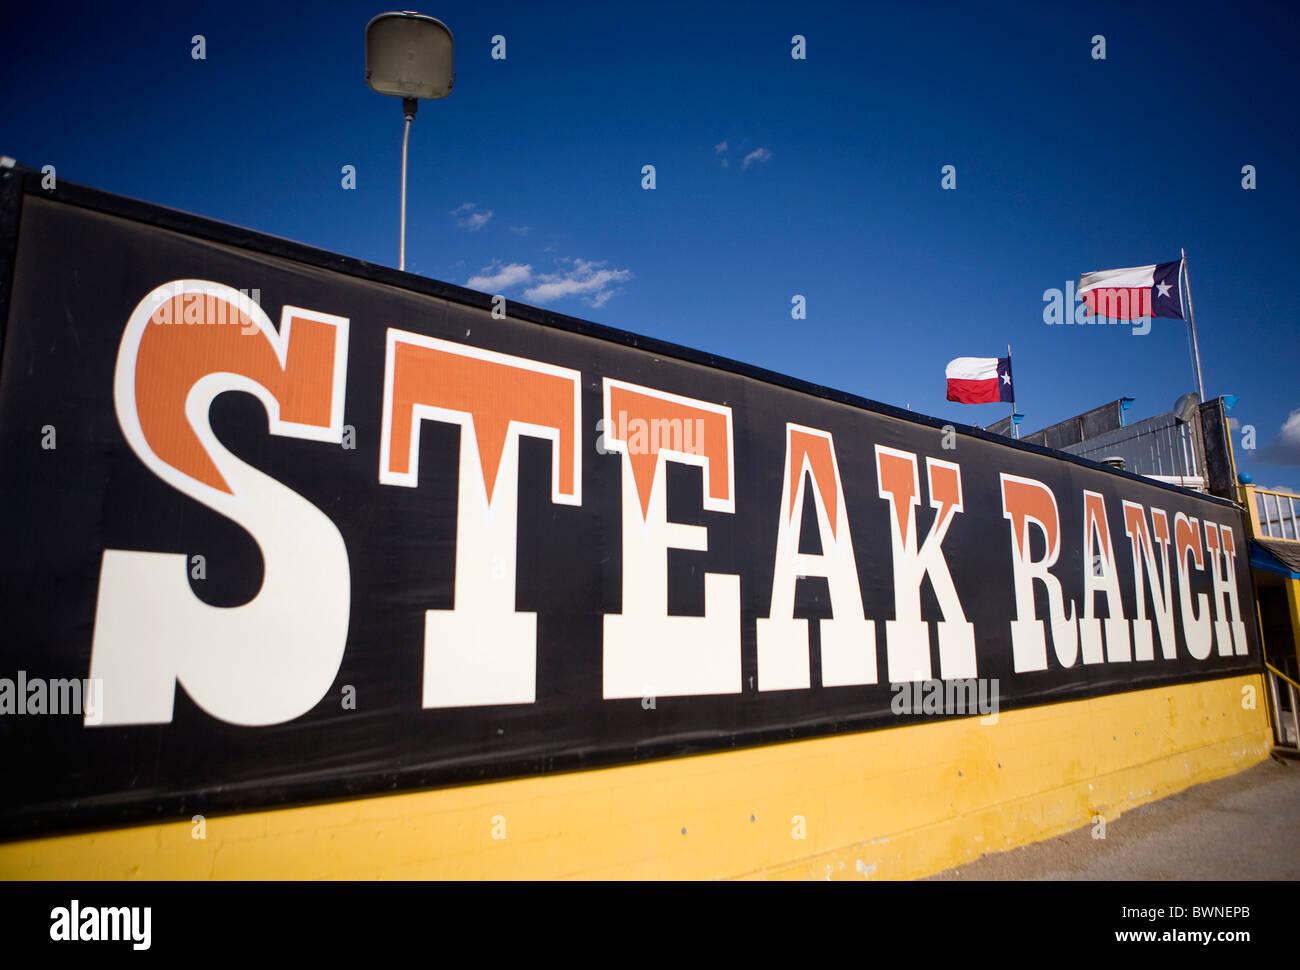 The Big Texan Steak Ranch in Amarillo Texas.  - Stock Image